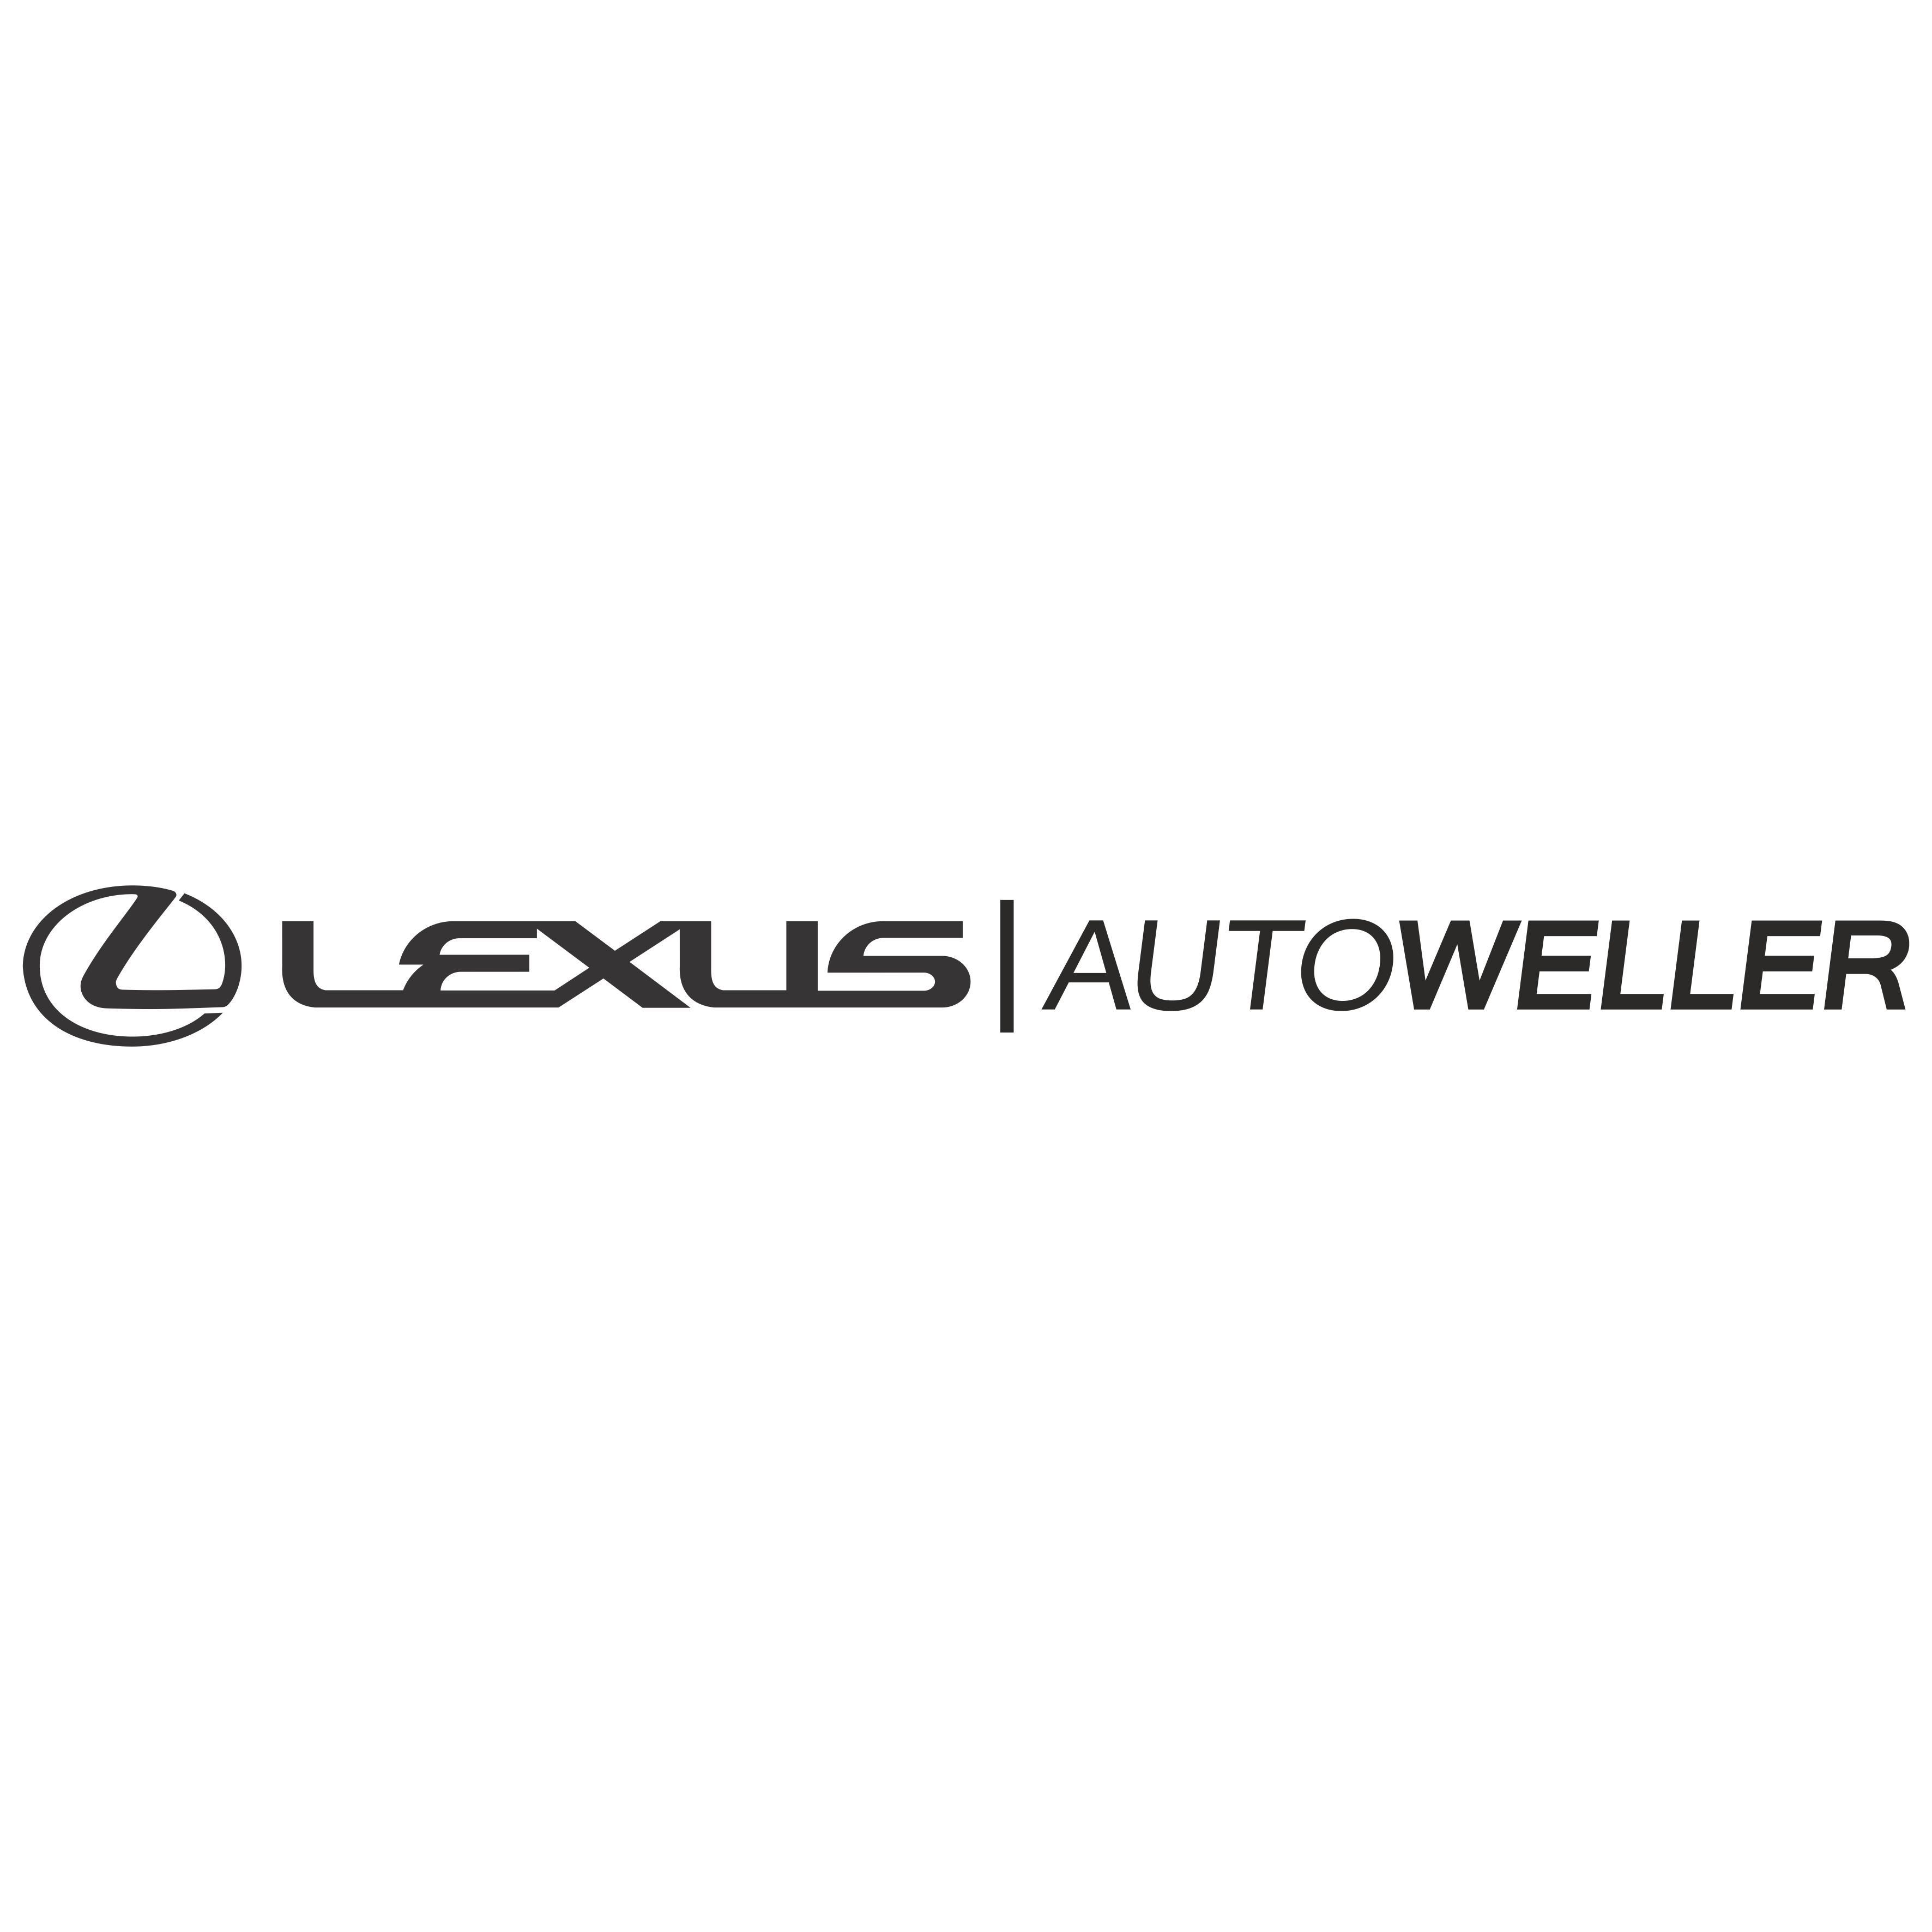 LEXUS_WELLER Logo